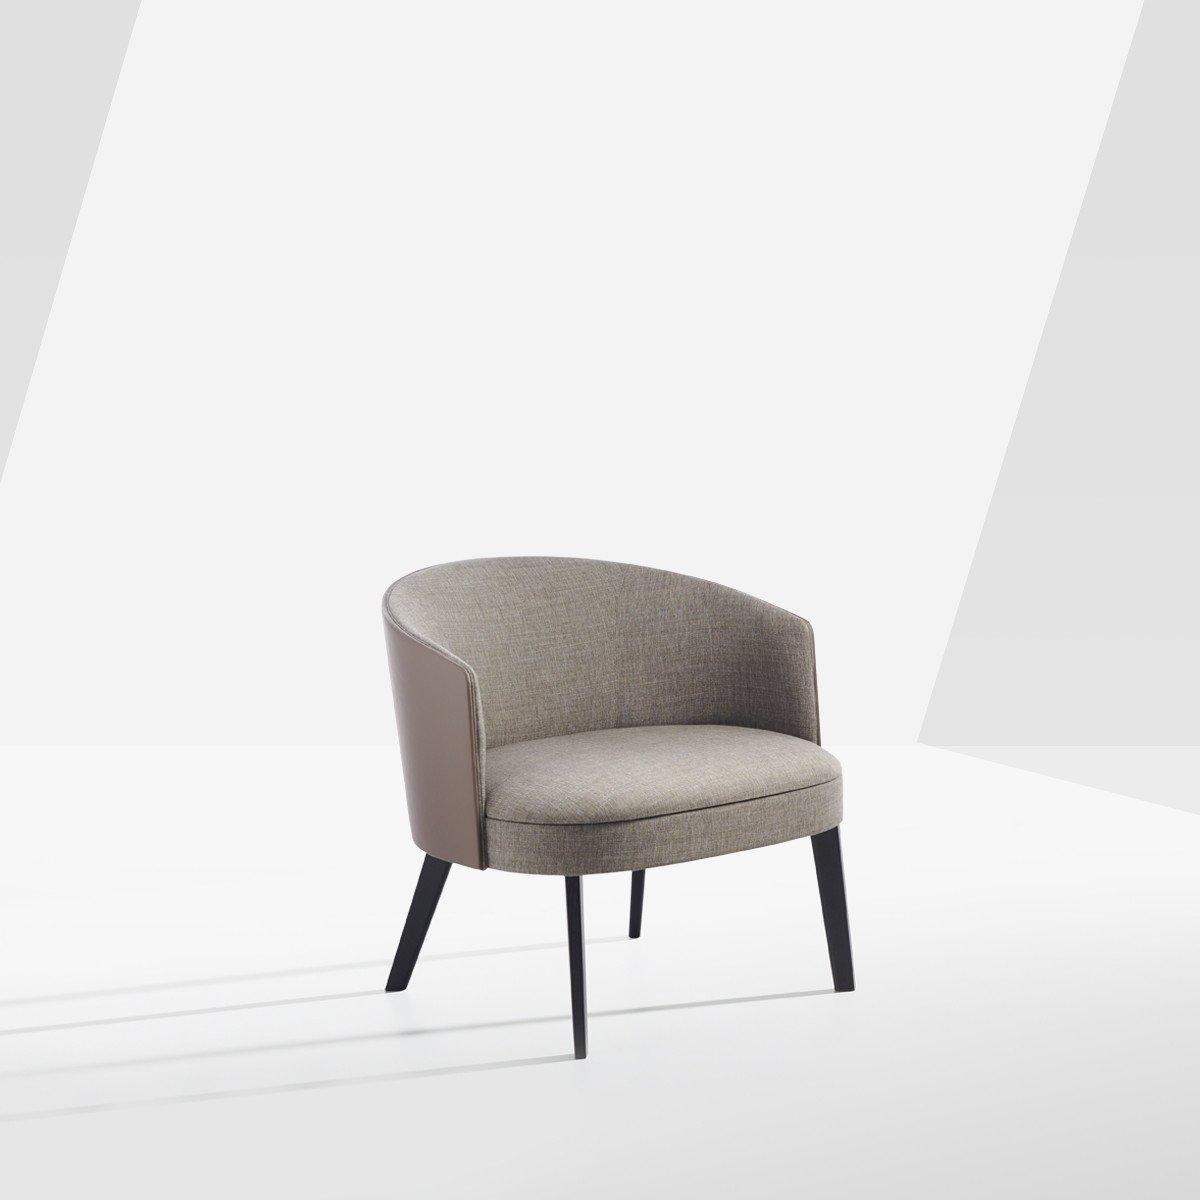 Lena Lounge Chair from Potocco, designed by Gabriele & Oscar Buratti